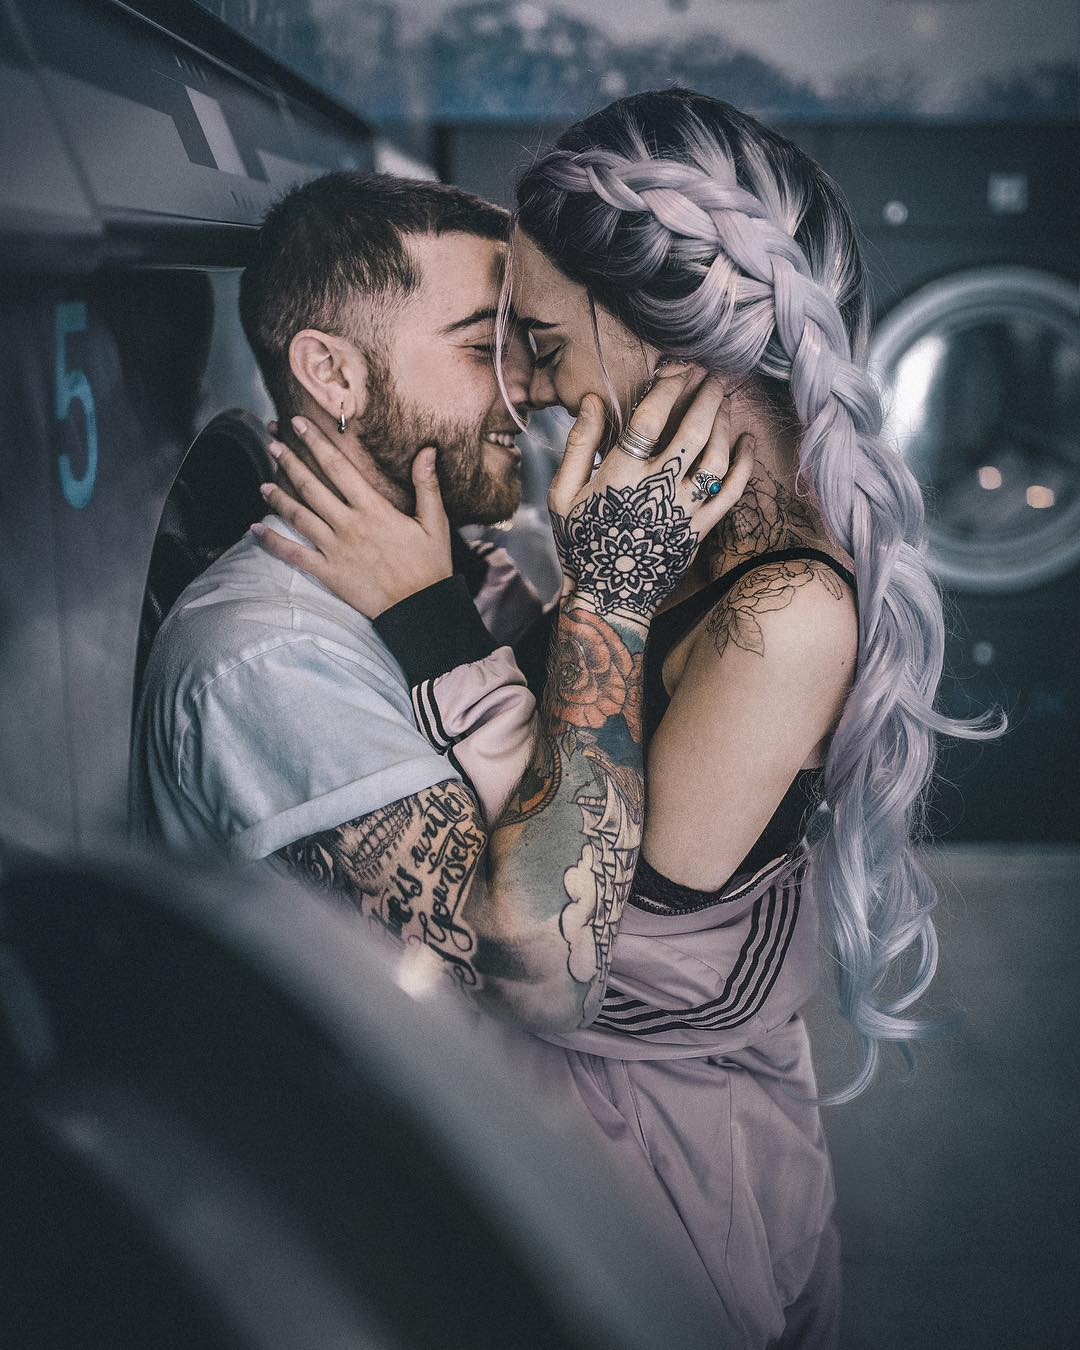 053427 Gahar ir عکس های عاشقانه دو نفره بوسه